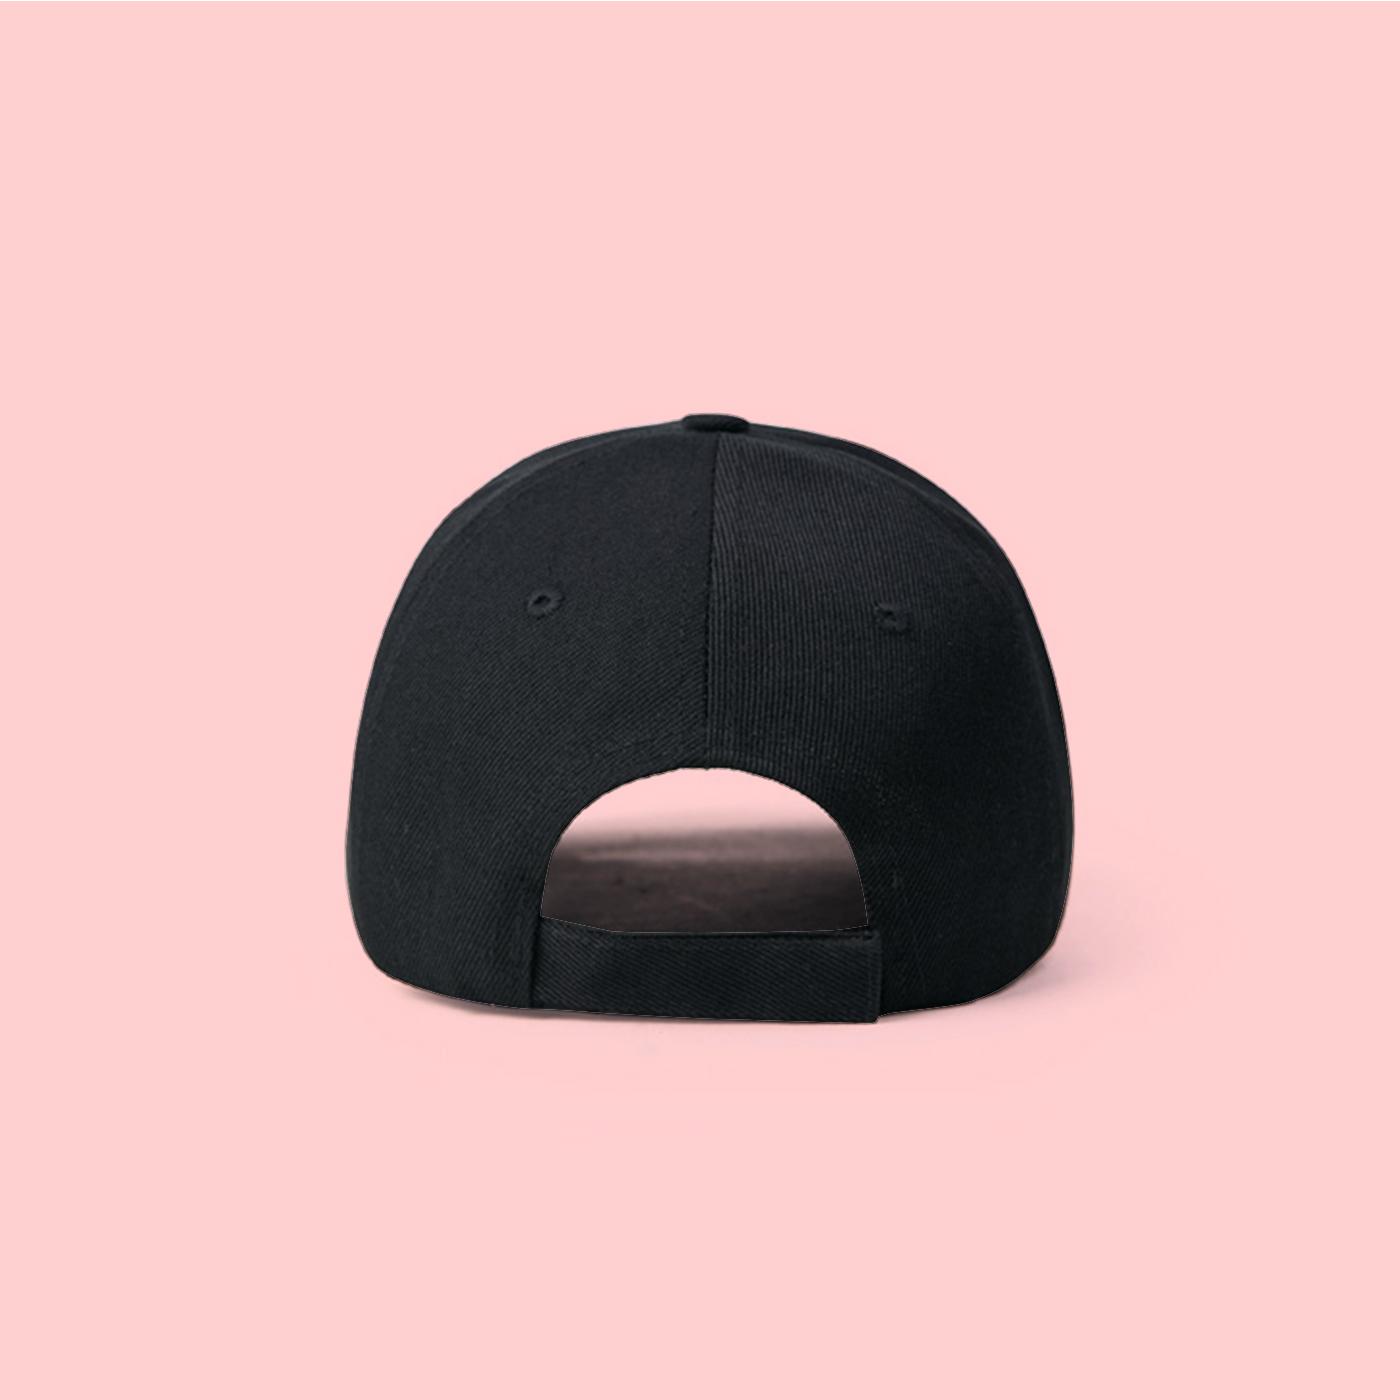 8091cc60a4f ... UNISEX VAPORWAVE ON A SEA WAVE BASEBALL CAP IN BLACK - Thumbnail 2